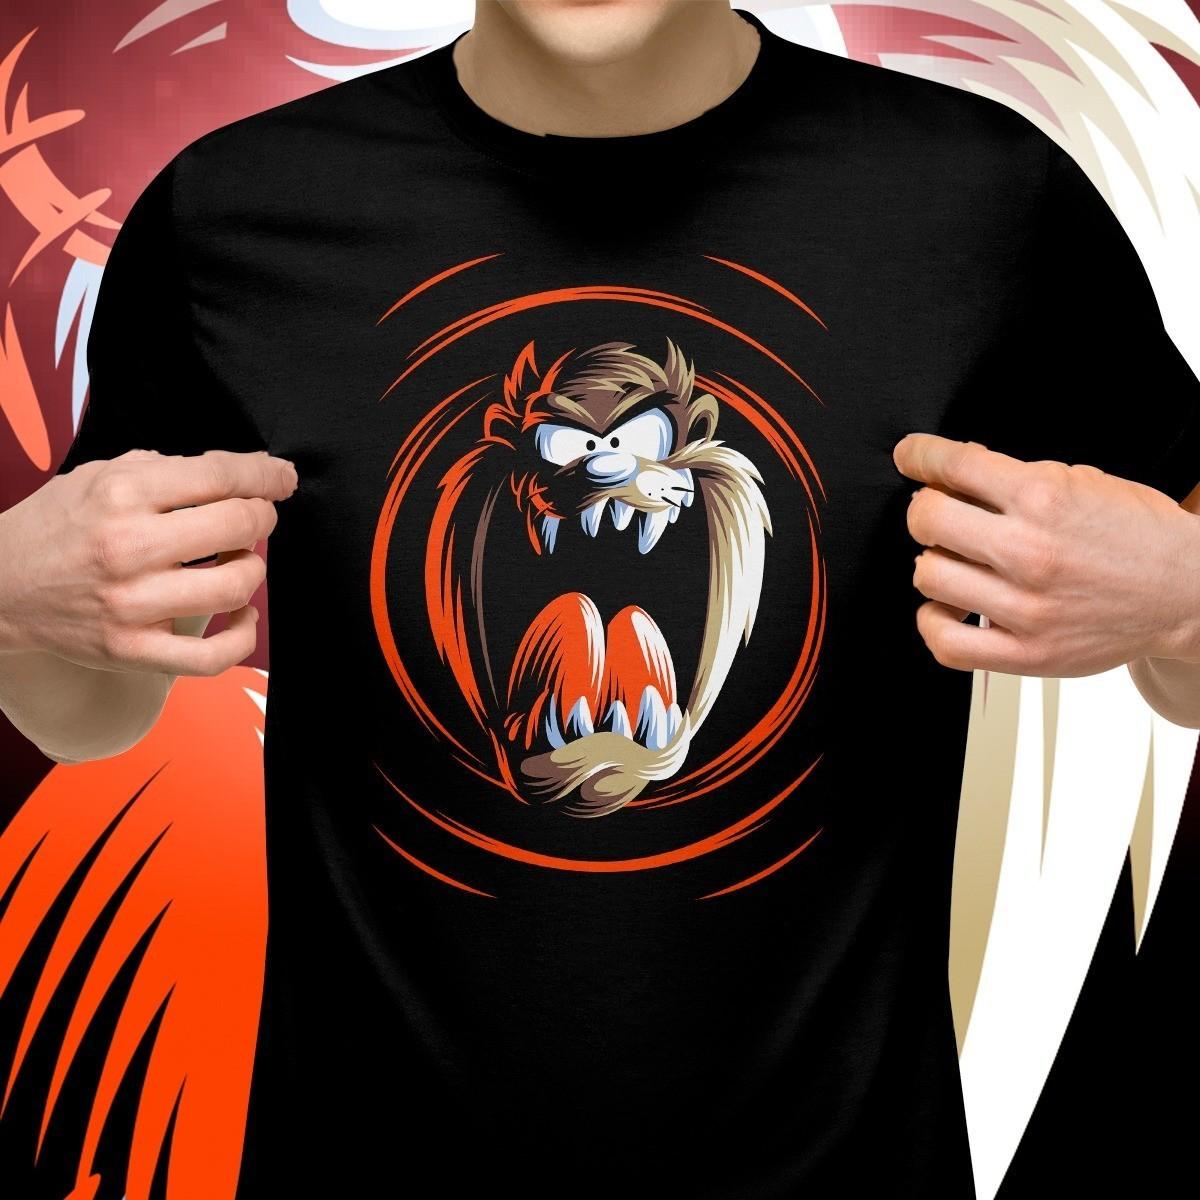 Camiseta Preta Unissex Taz-Mania: Taz o demónio da Tazmania